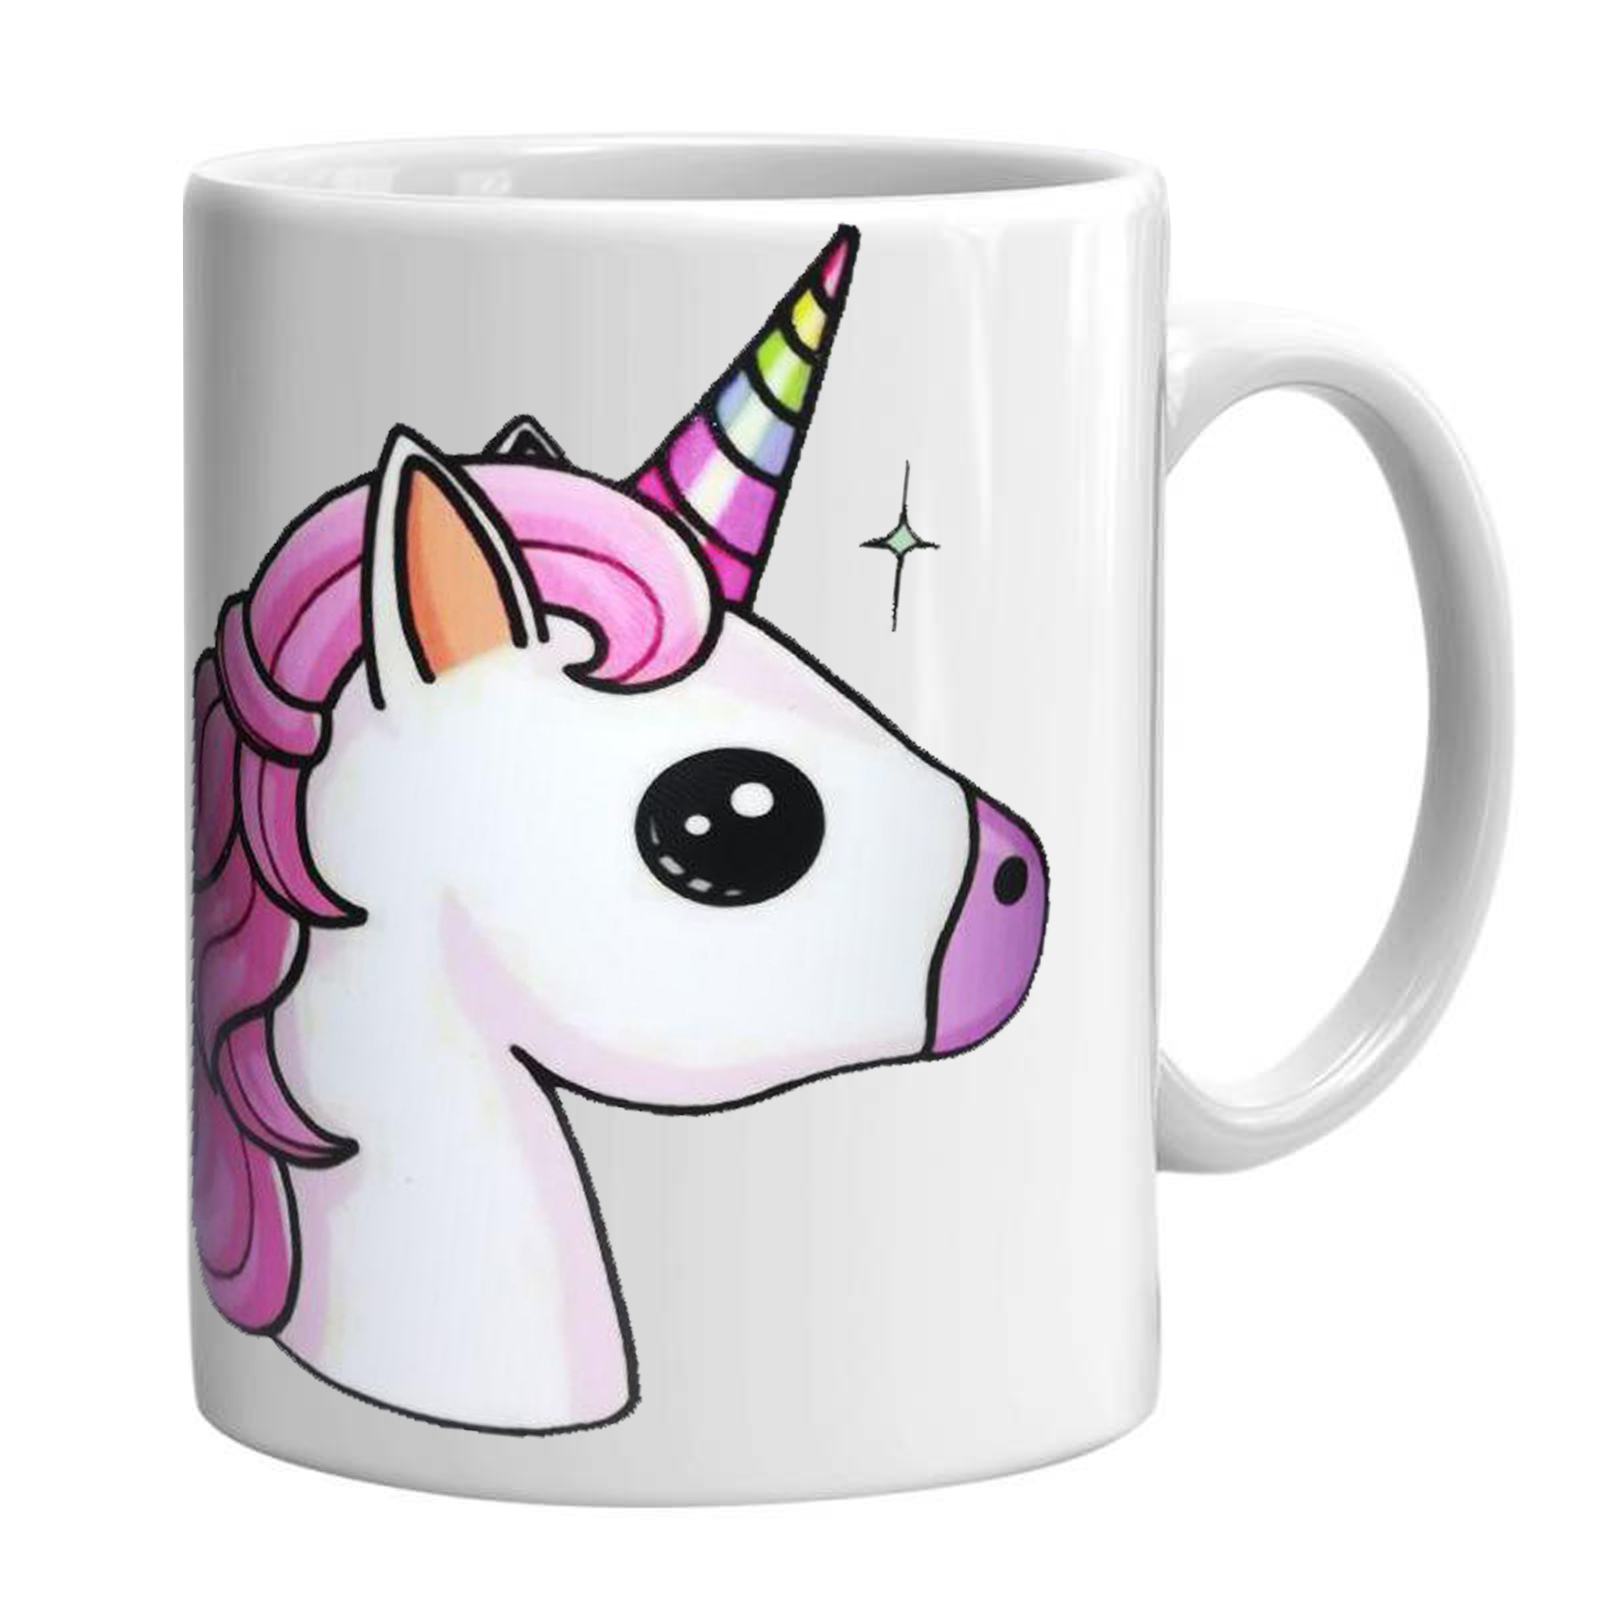 ماگ طرح unicorn مدل اسب تک شاخ کد 3872